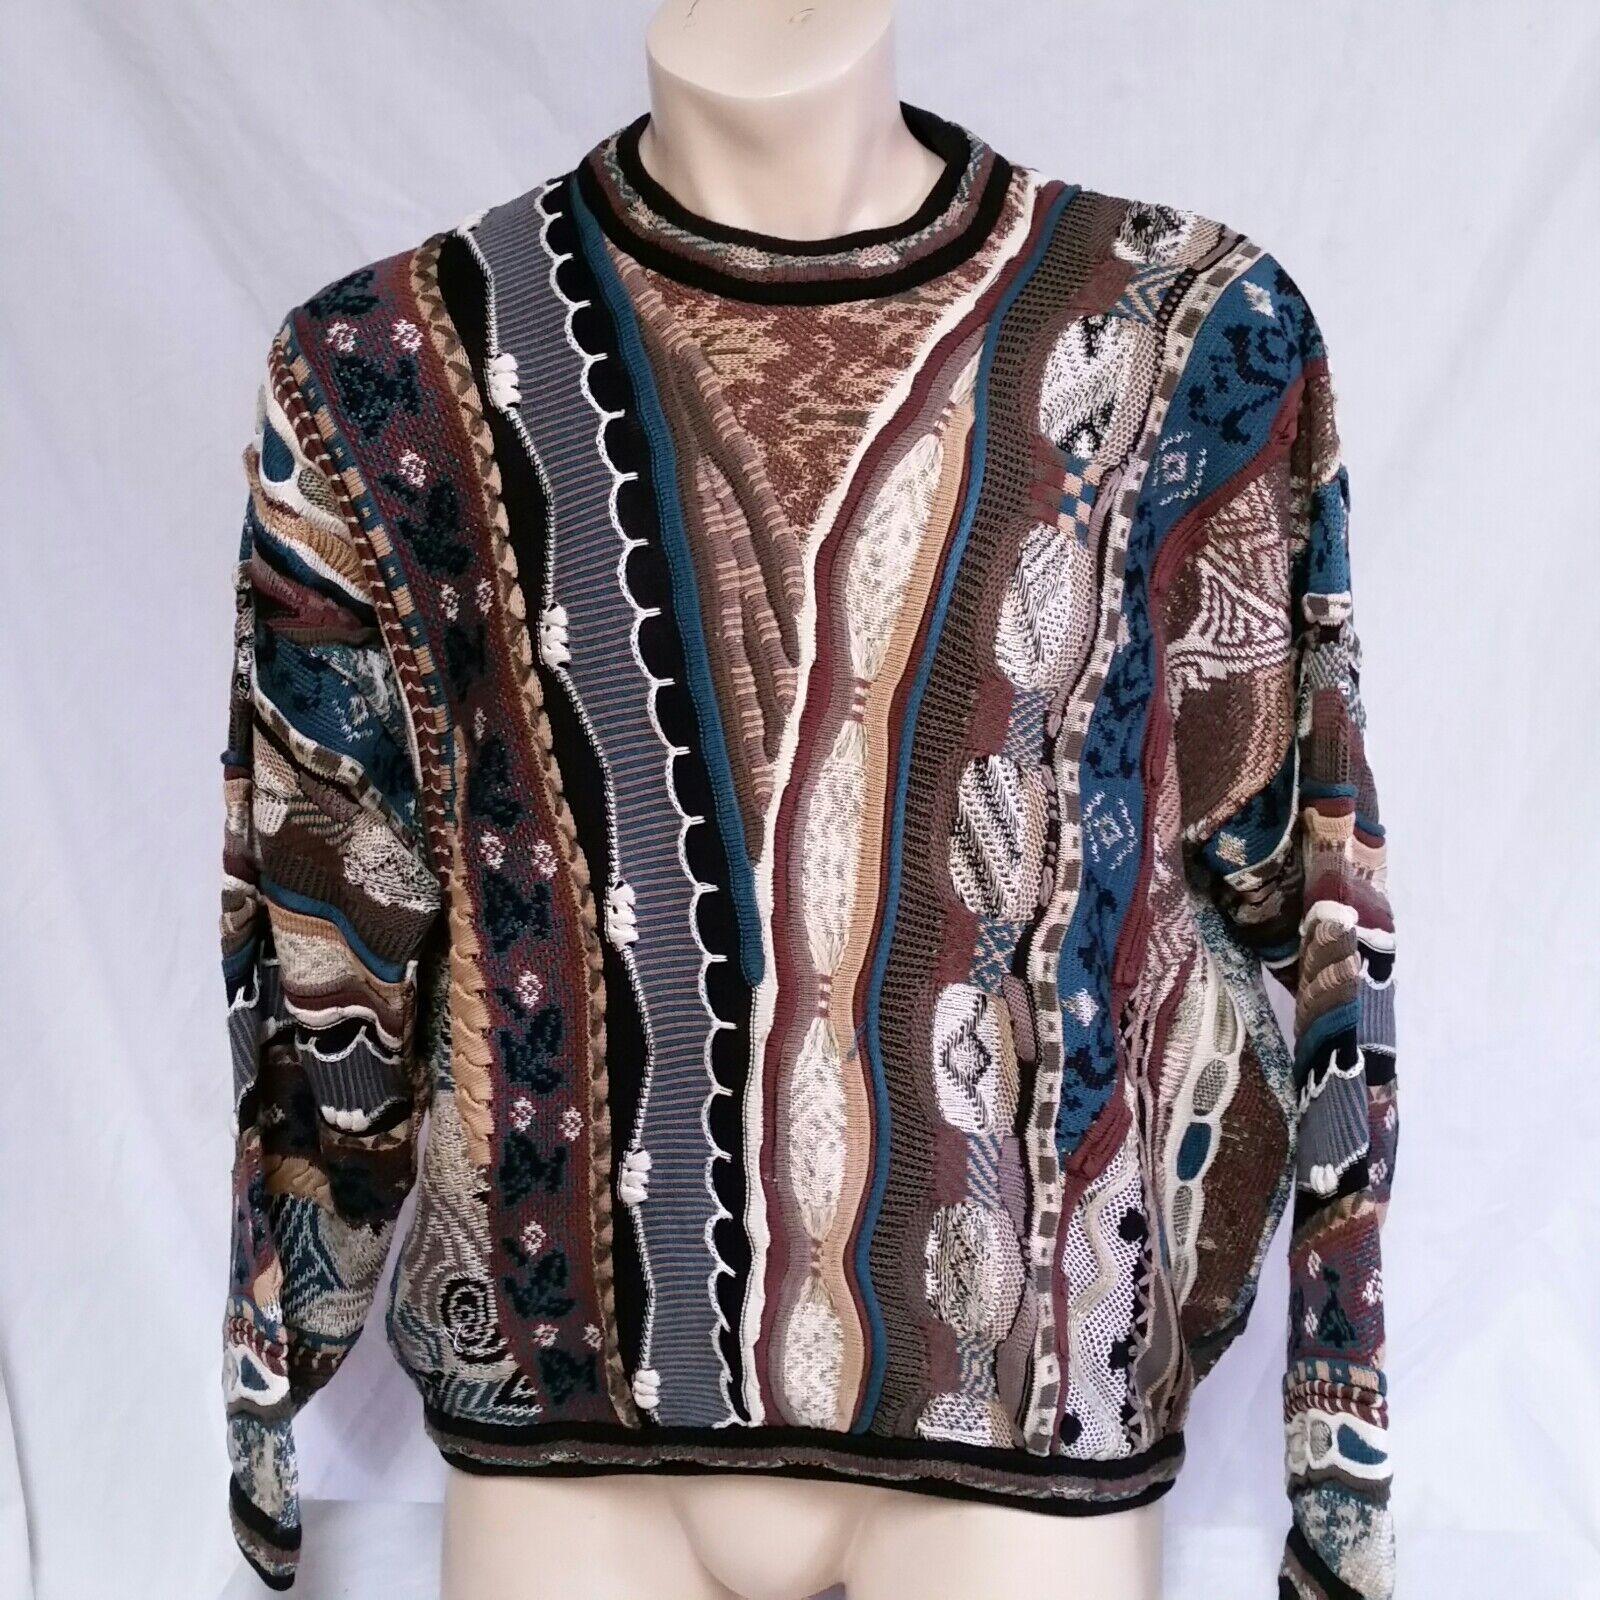 Tundra Canada Sweater Mercerized Cotton 3d TextuROT Bright Loud VTG  Herren Large